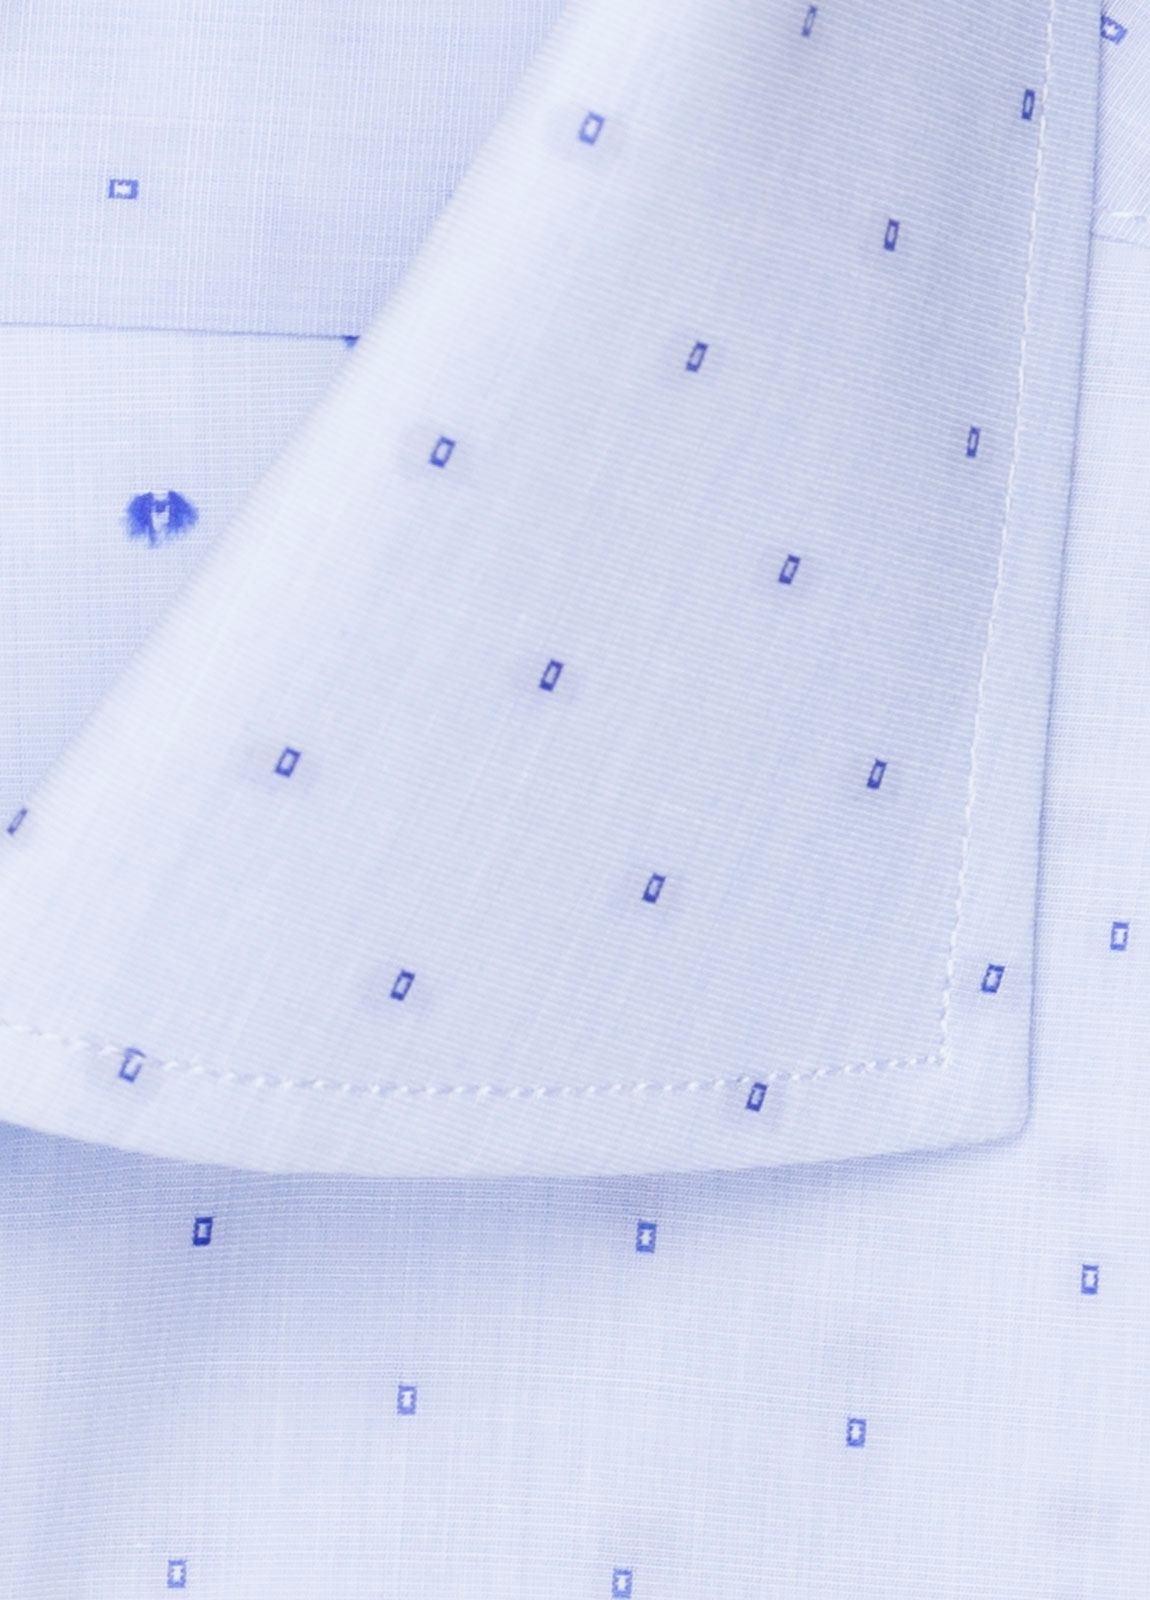 Camisa vestir FUREST COLECCIÓN REGULAR FIT fil coupé celeste - Ítem2